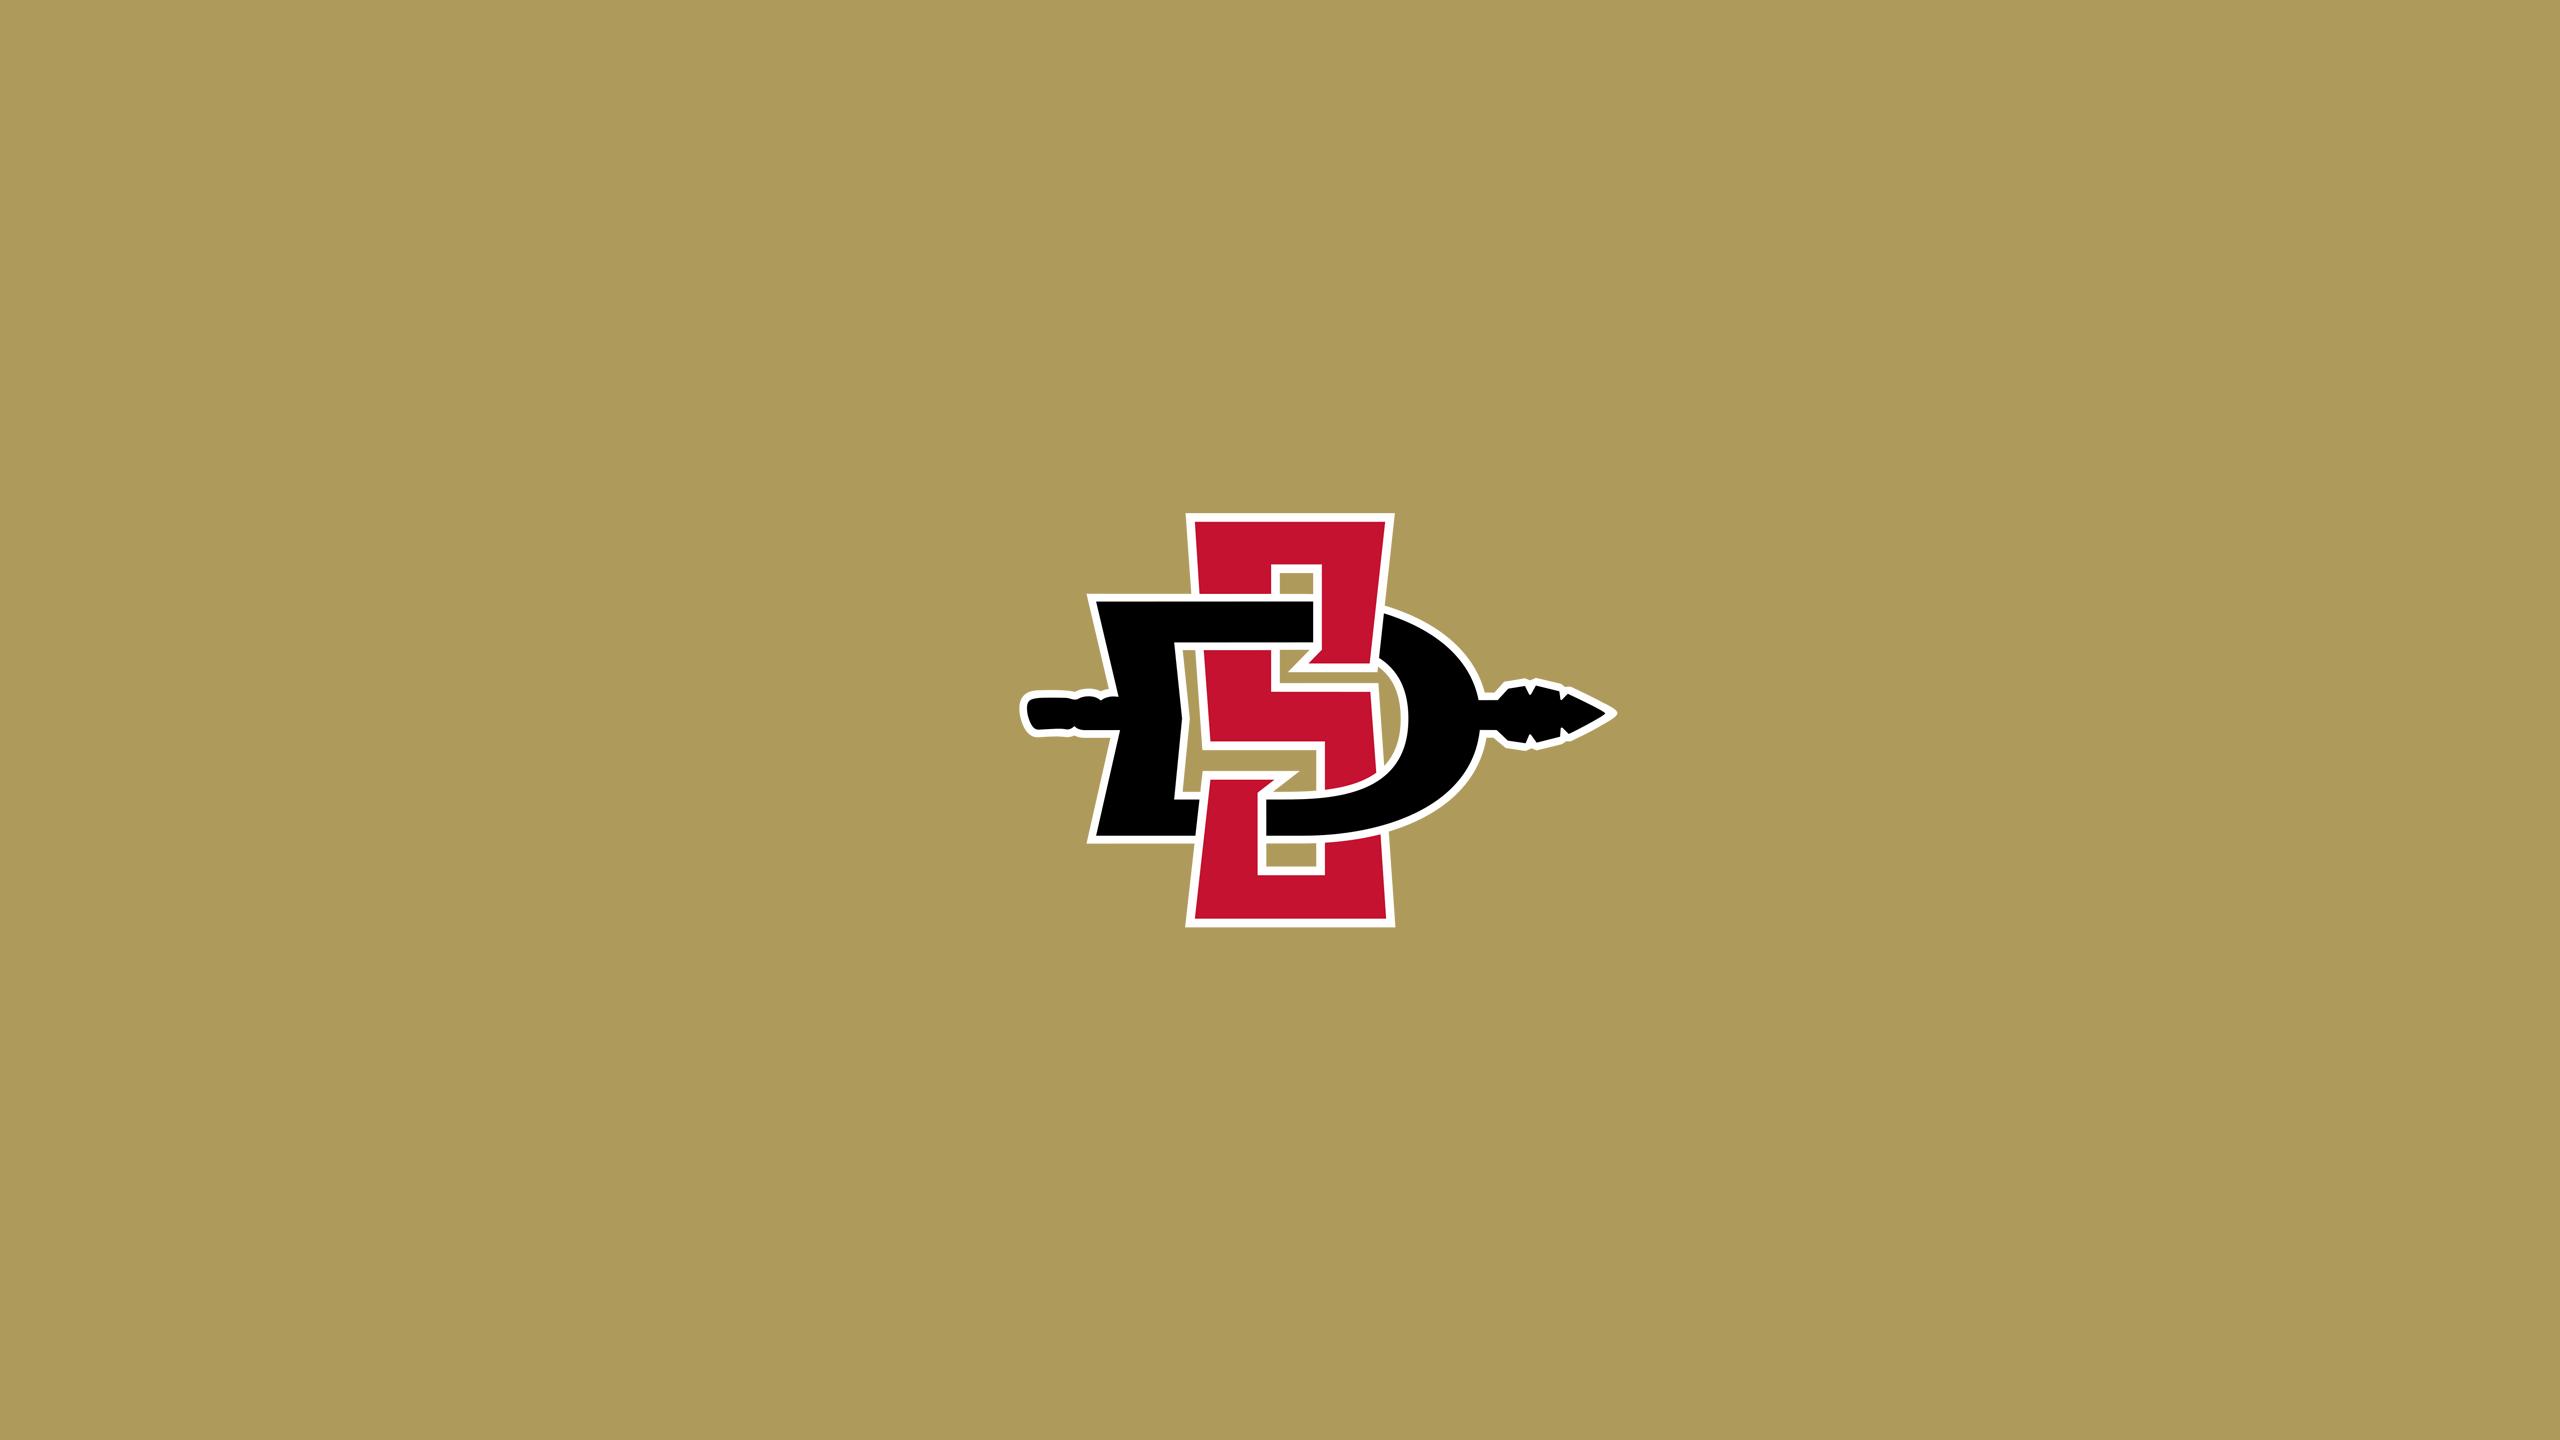 San Diego State University Aztecs